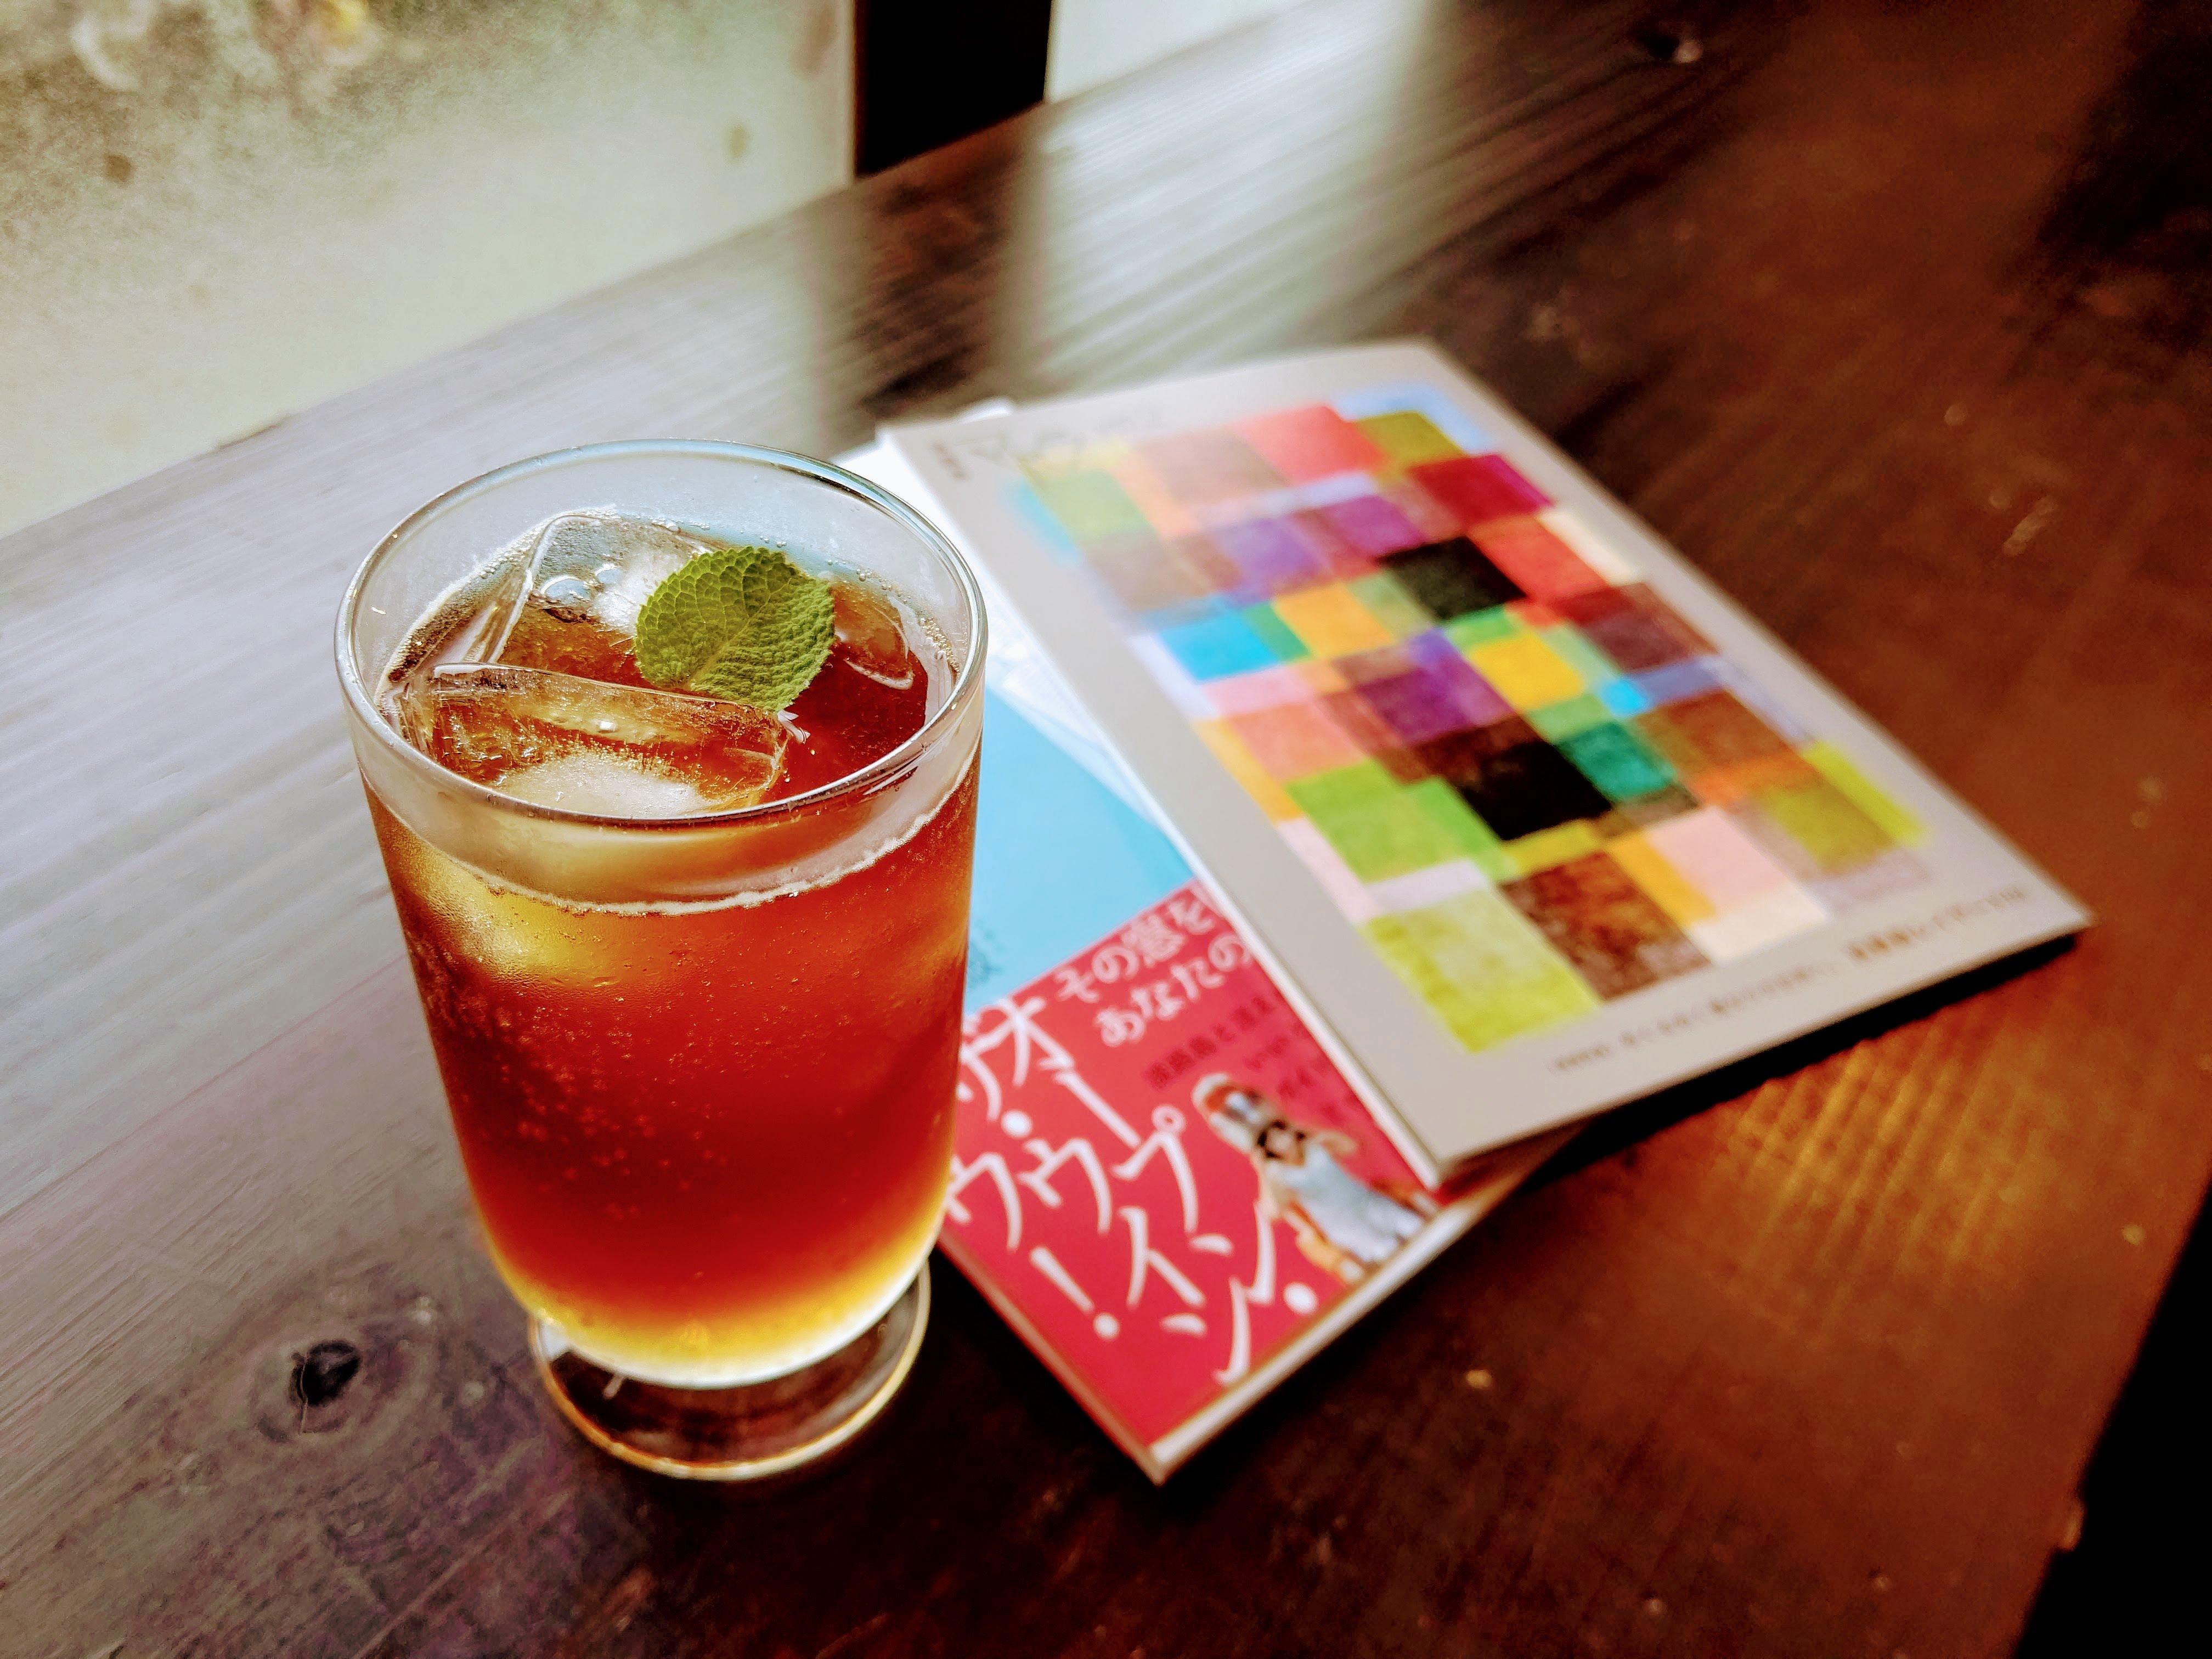 Book&Coffee coyomi コーヒースカッシュ